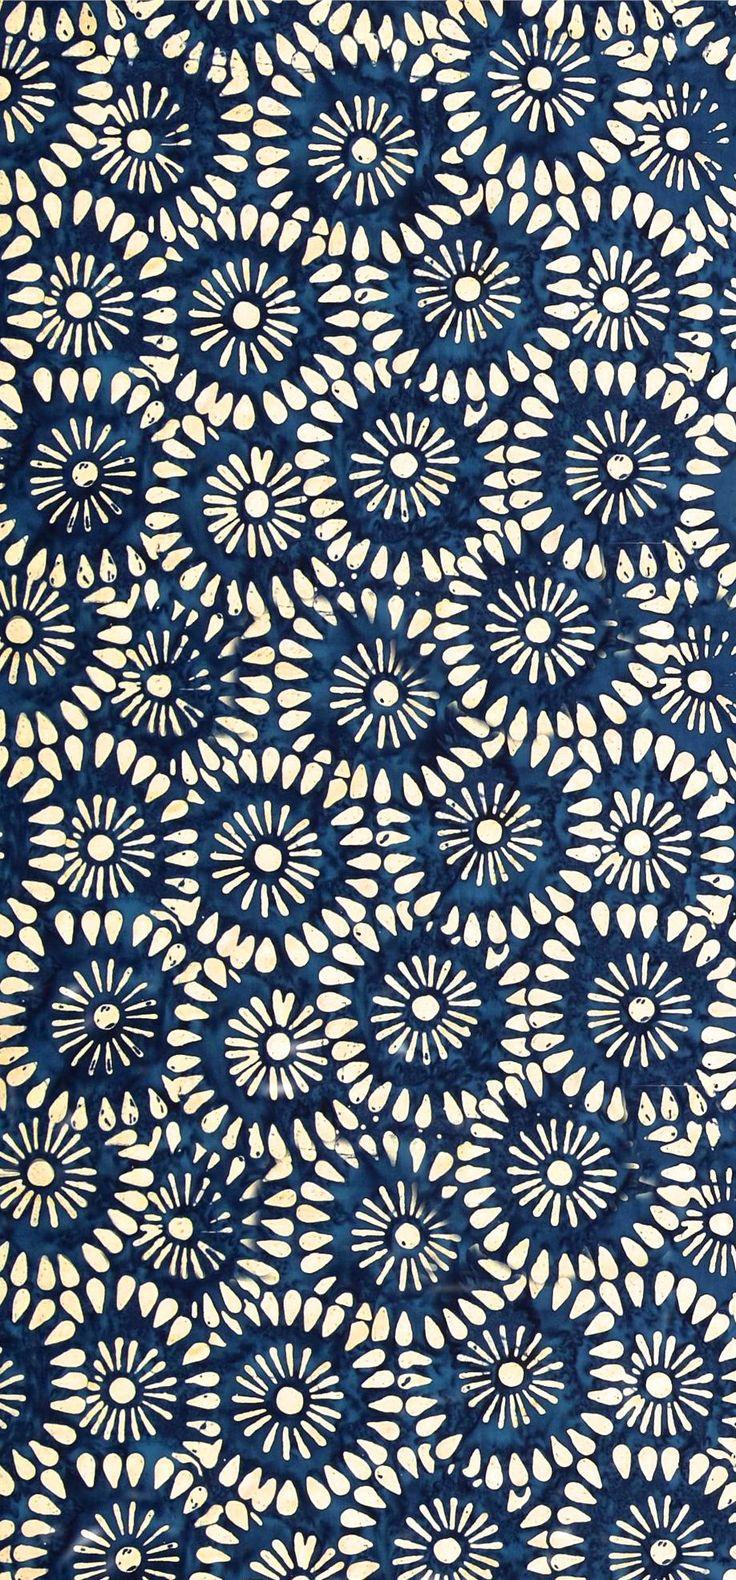 """Tonga Batik Kiss"".  Indonesian batiks from Timeless Treasures via fabric."